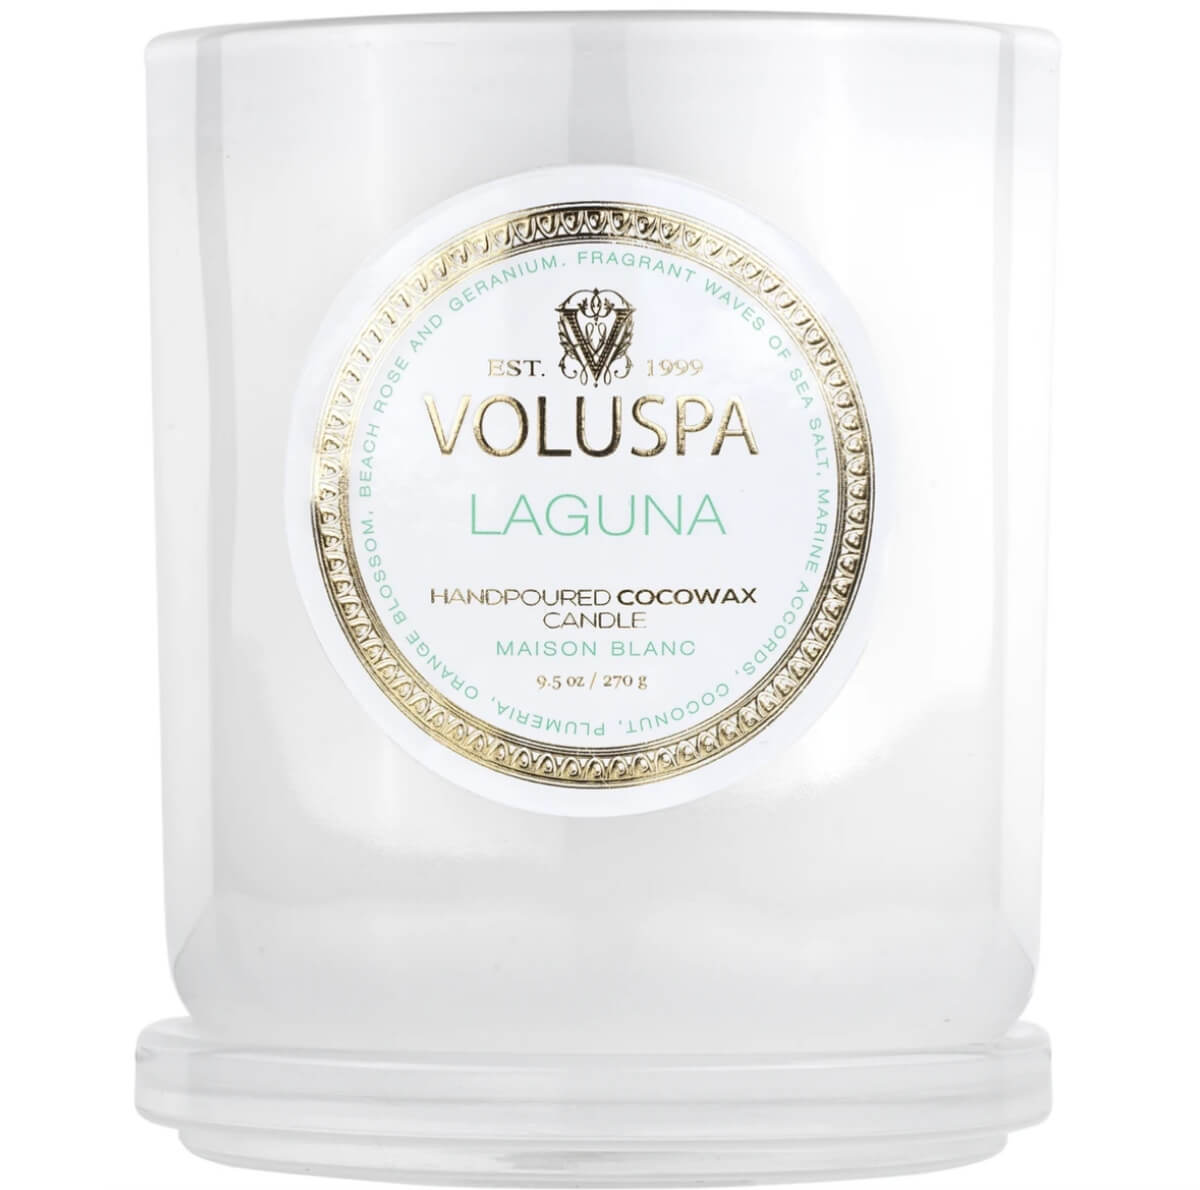 voluspa-laguna-candle-081221